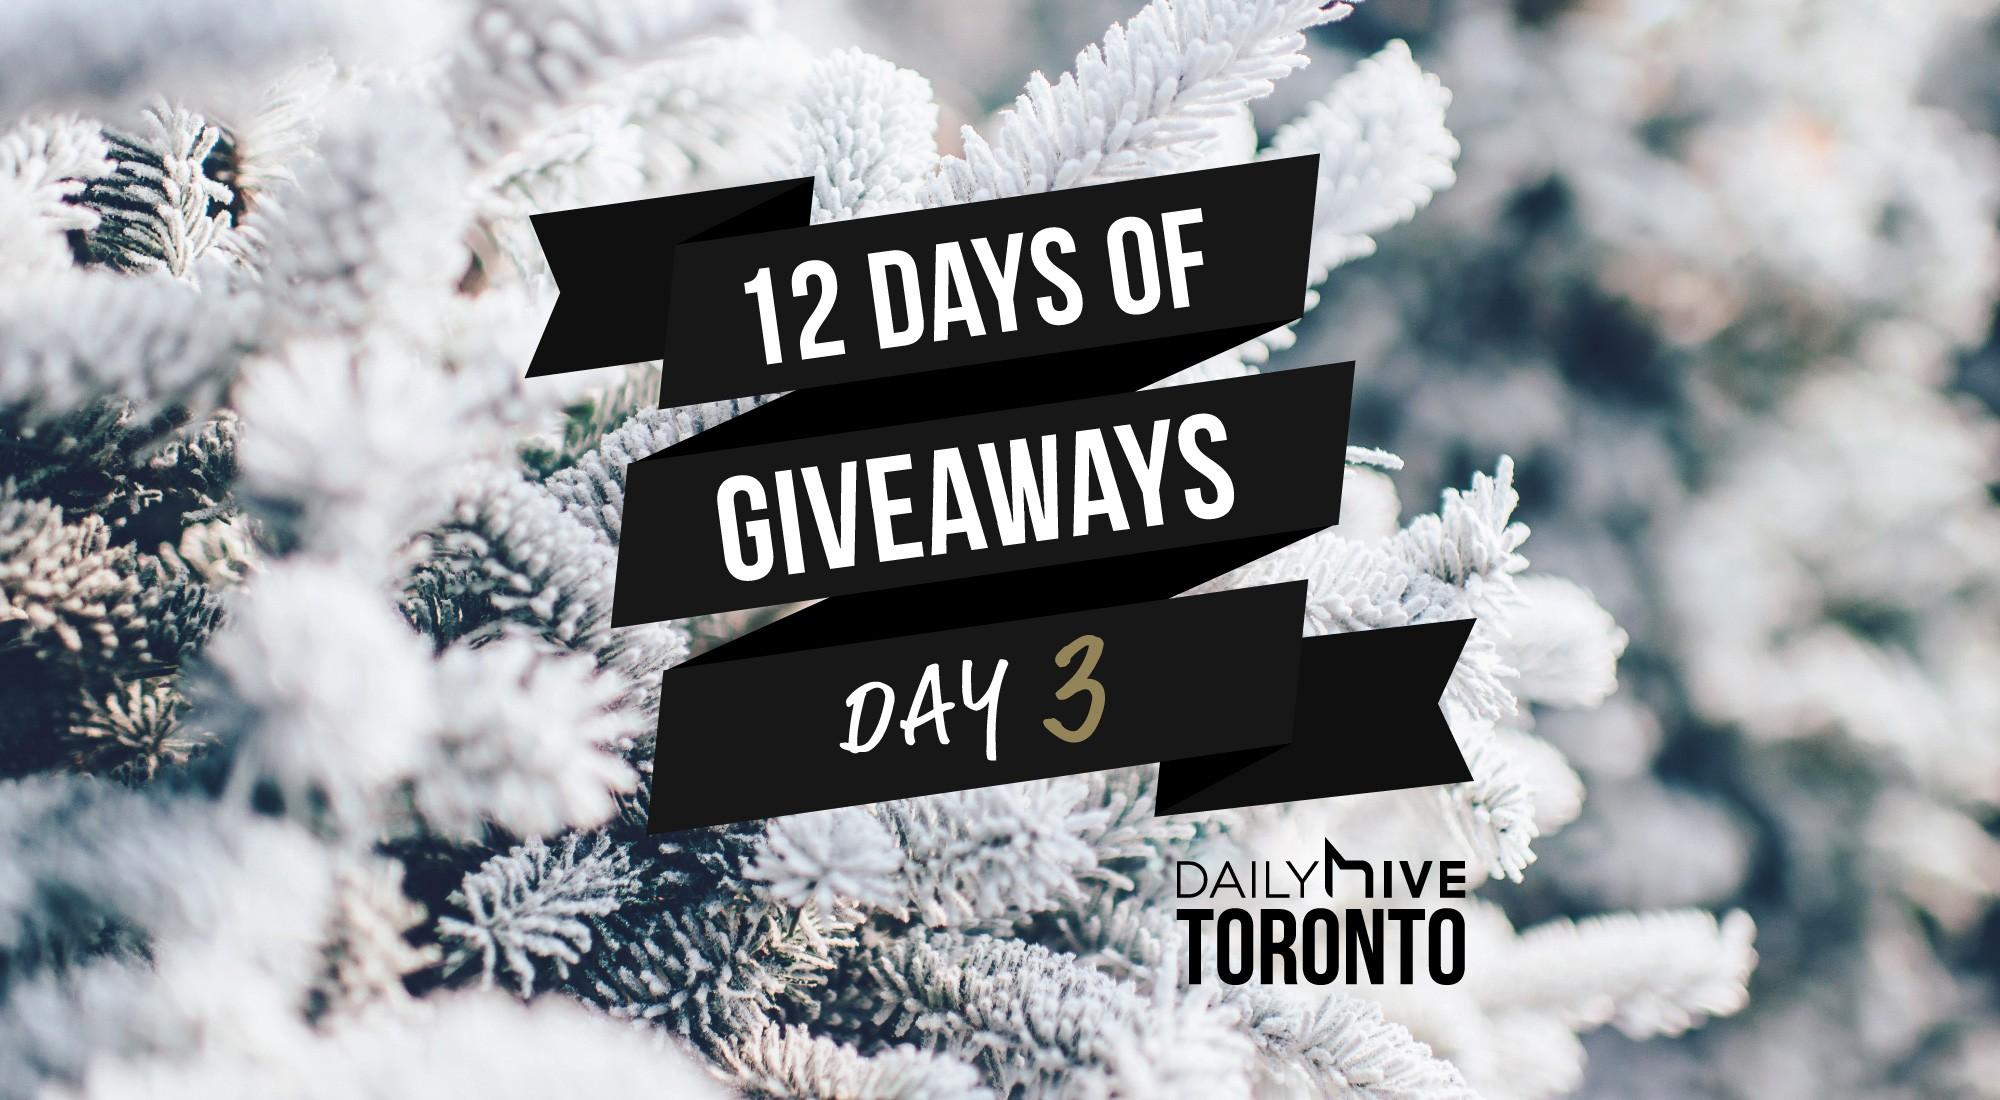 12 days of giveaways toronto 3